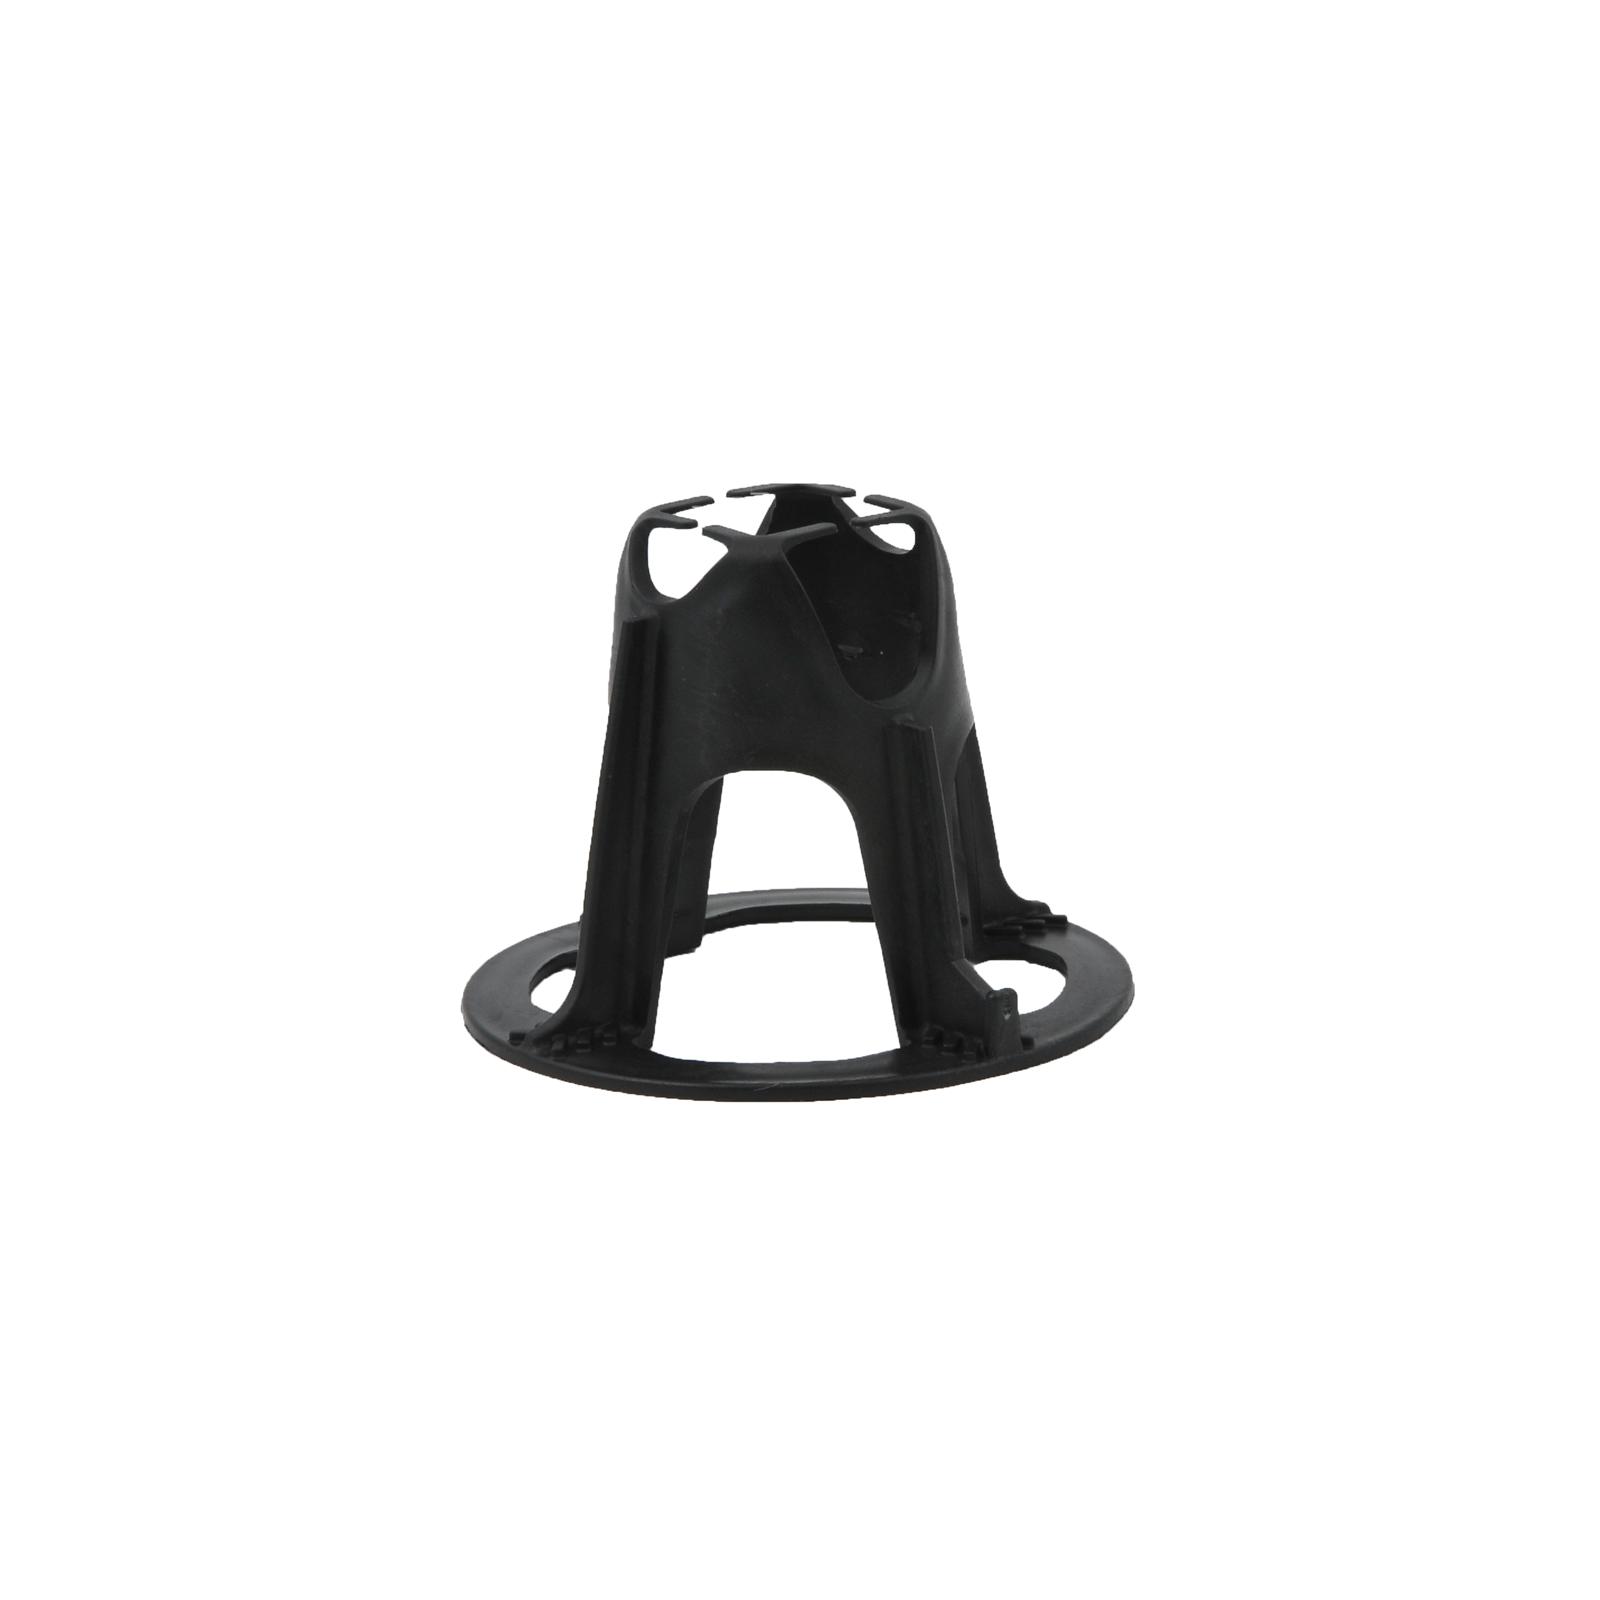 Whites 50 - 65mm Plastic Reinforcing Bar Chair - 20 Pack